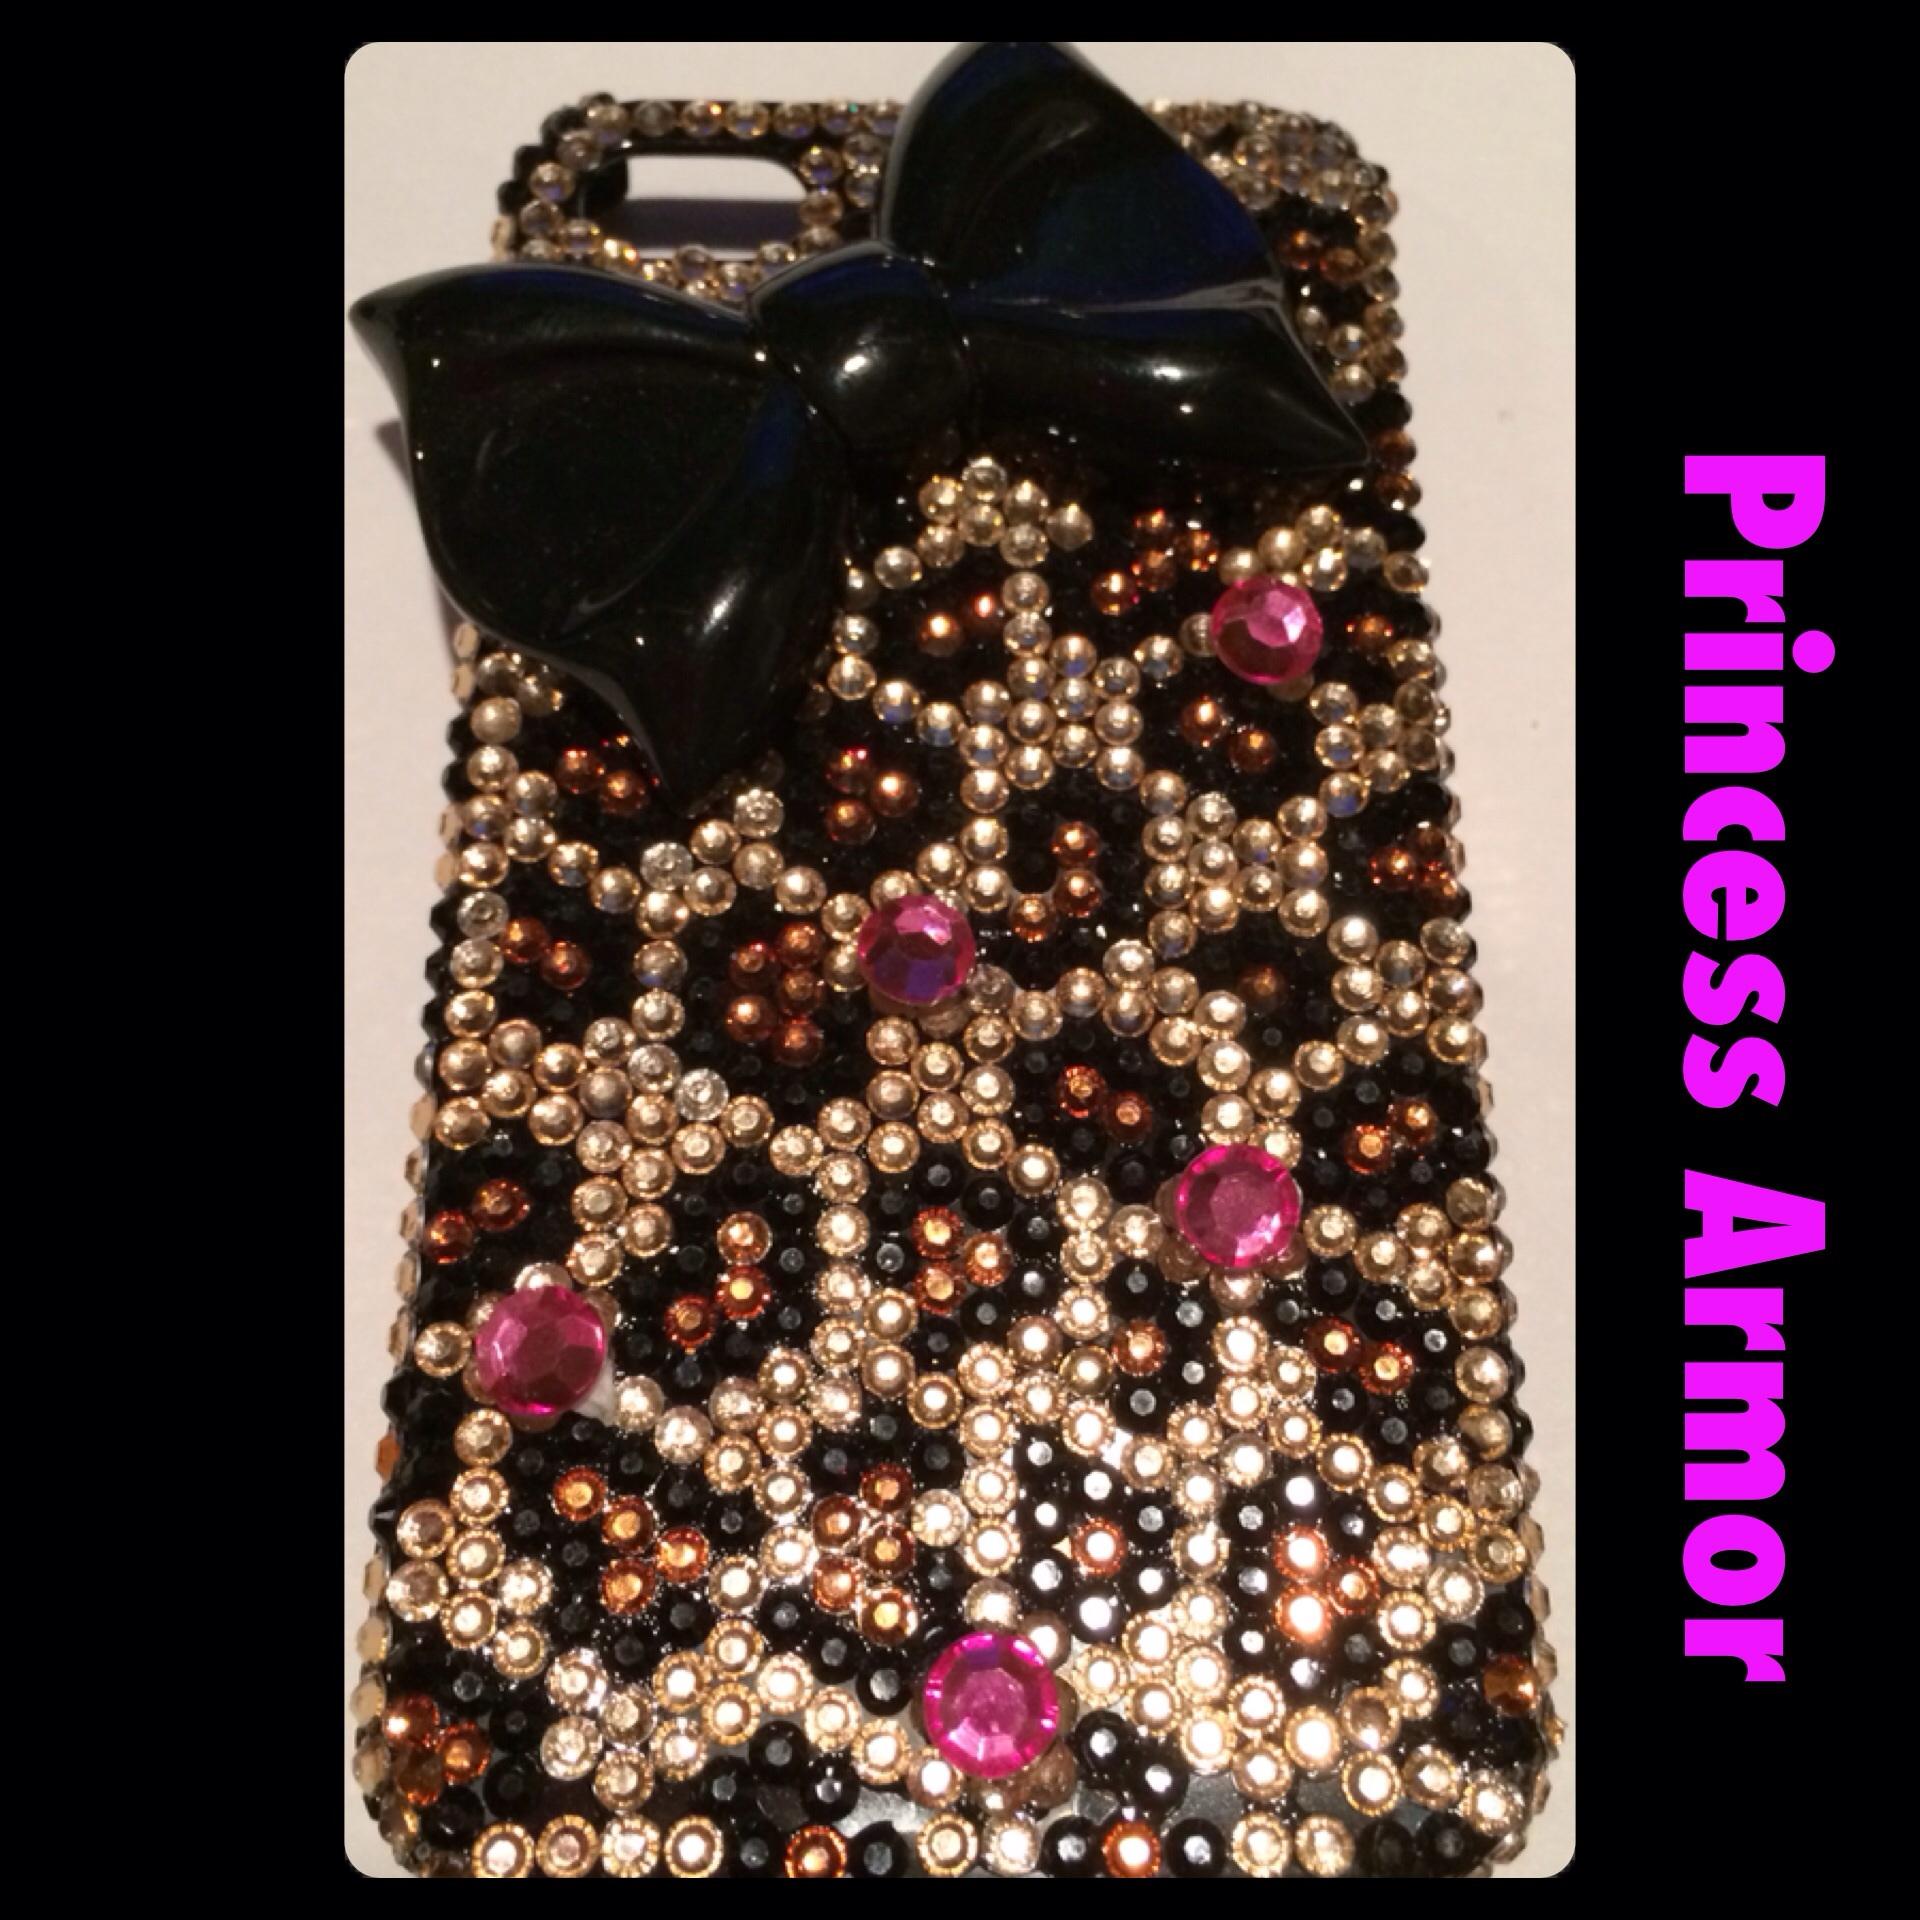 Eharmony princess loves phone sex n cyber skin dildos 7